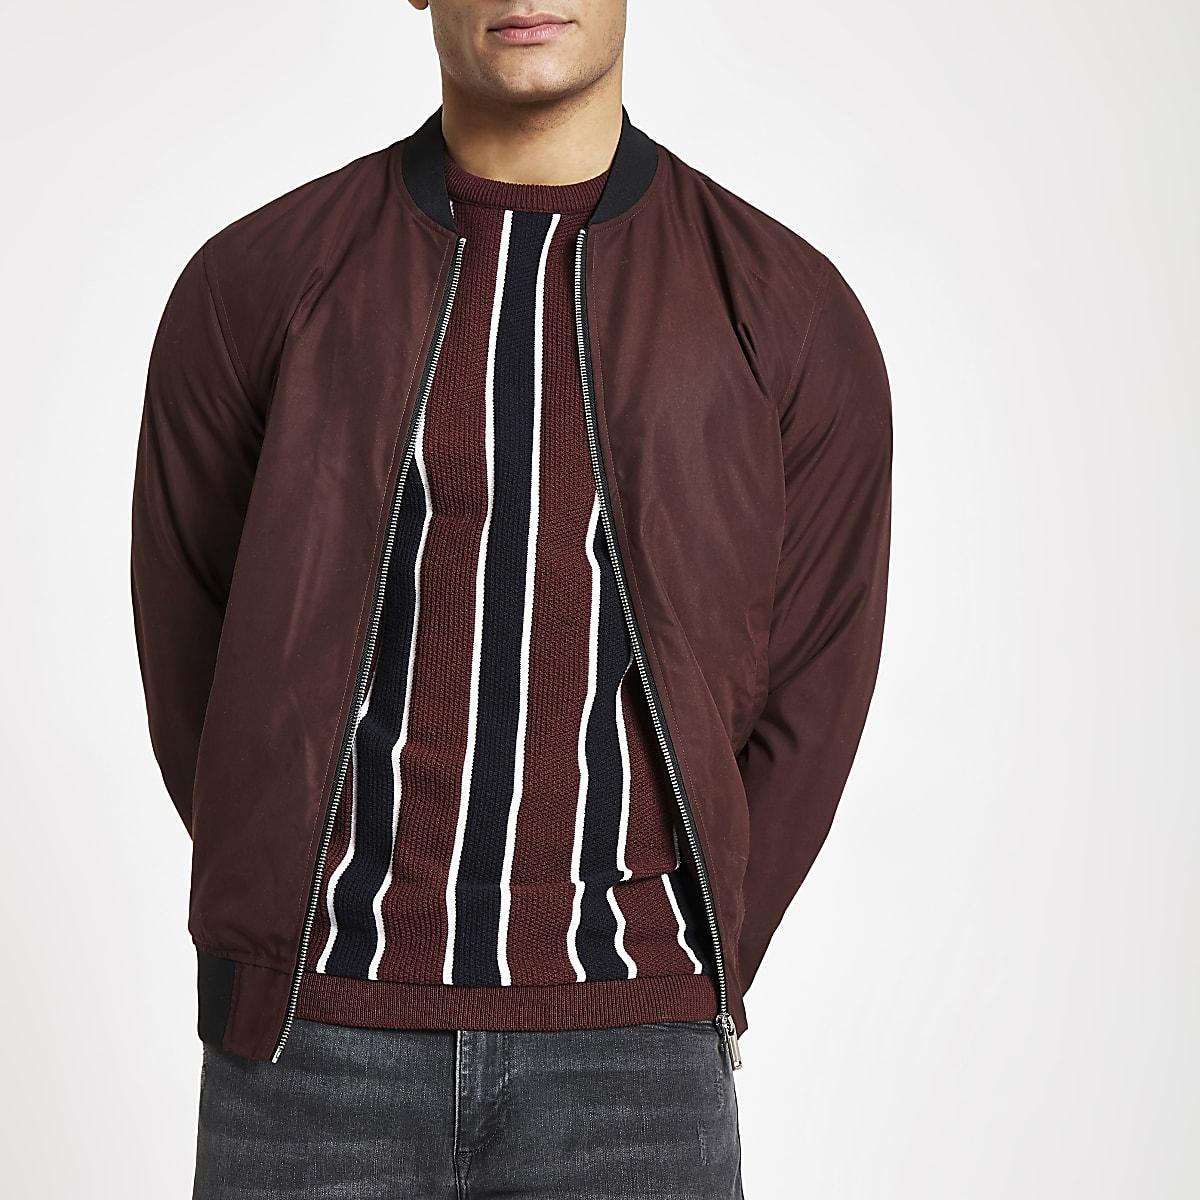 meet a57c3 4ab2b Dark red bomber jacket